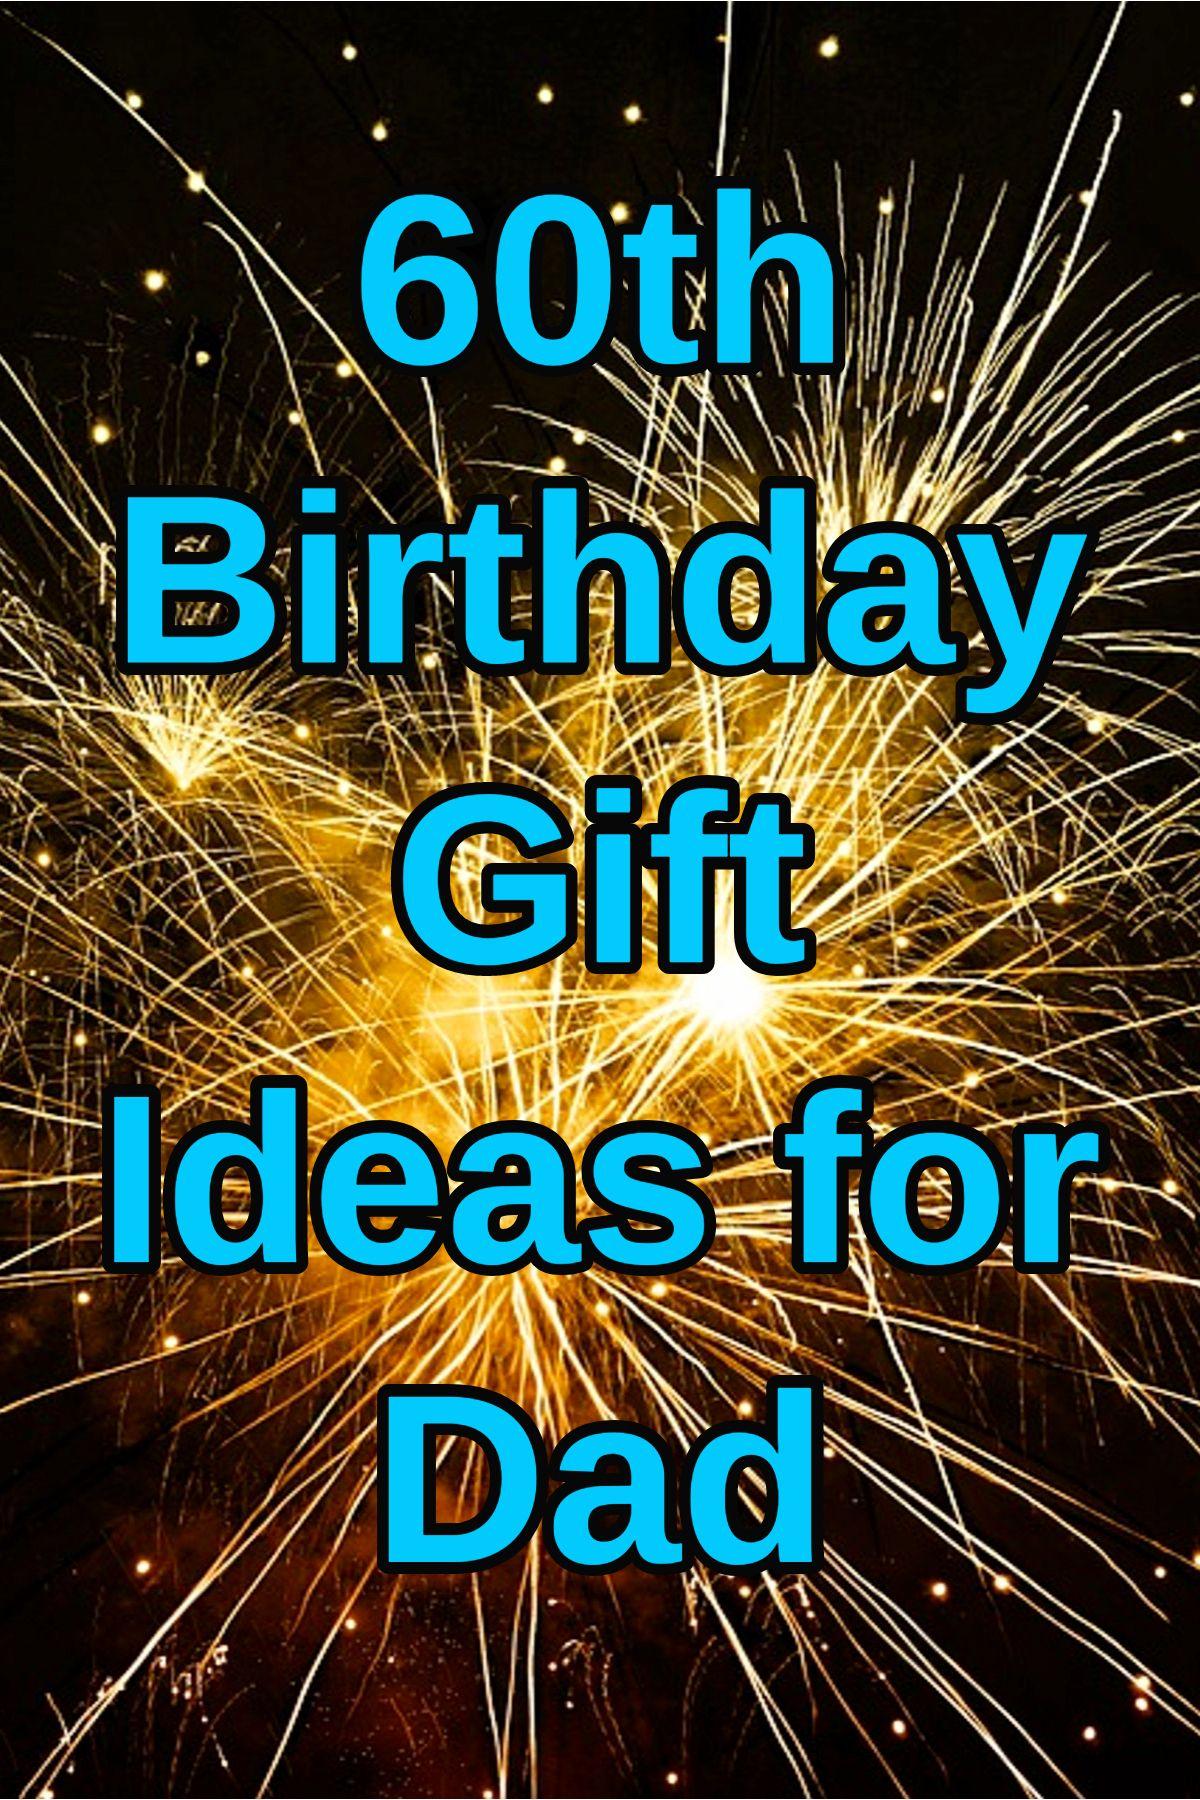 Best 60th birthday gift ideas for dad 60th birthday